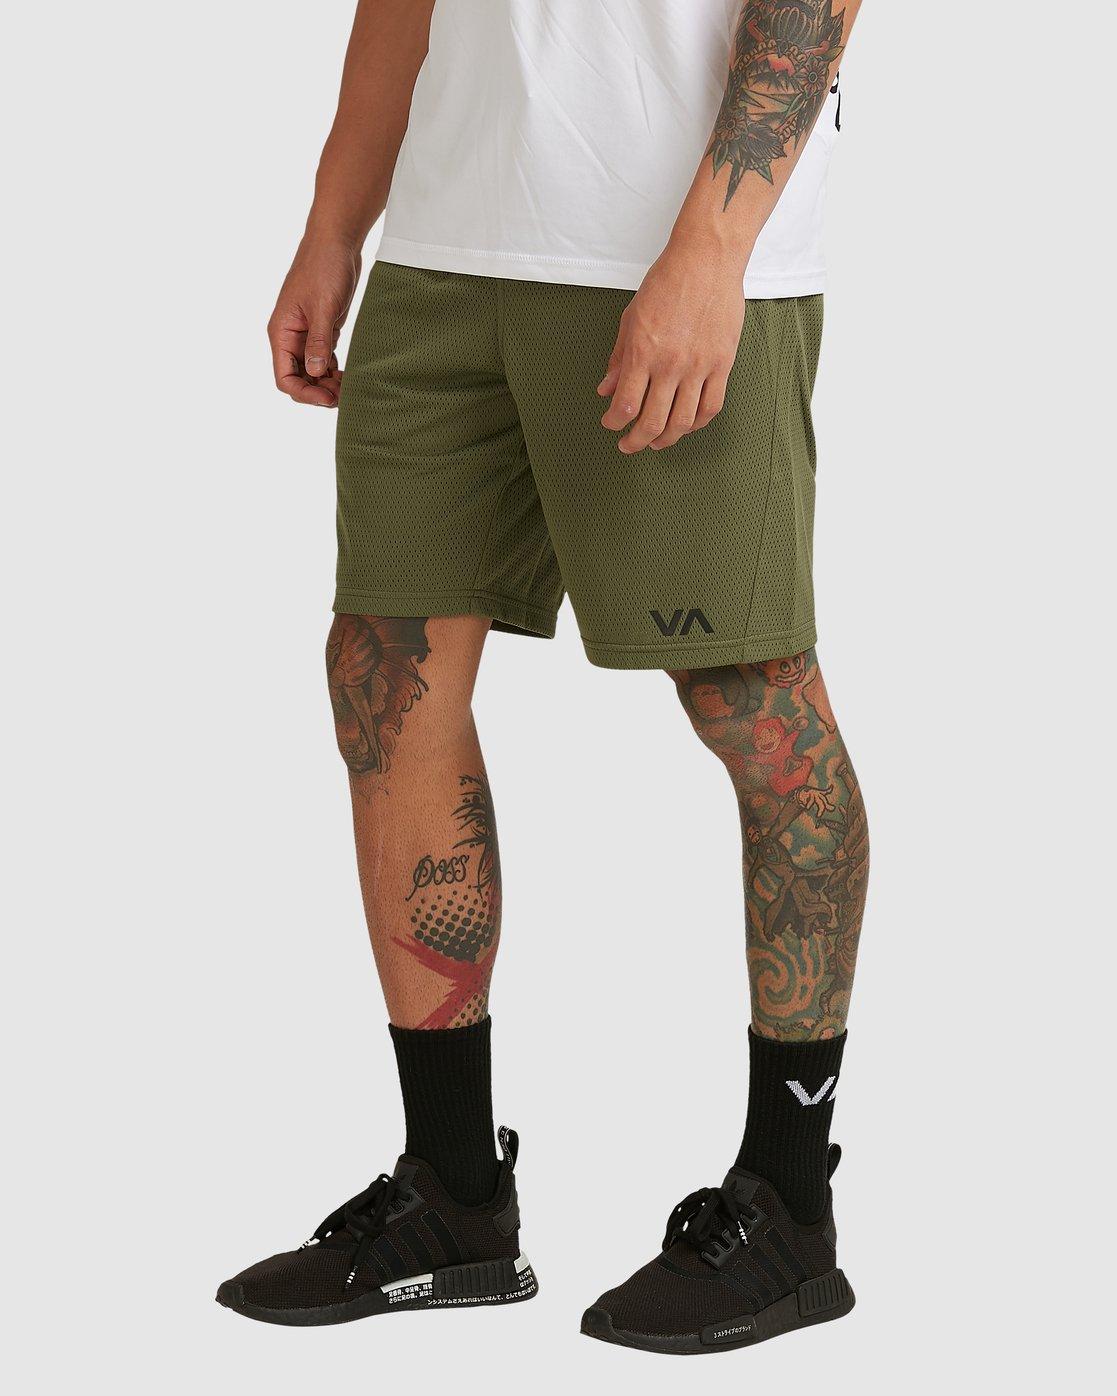 0 Va Mesh Short Green R305311 RVCA